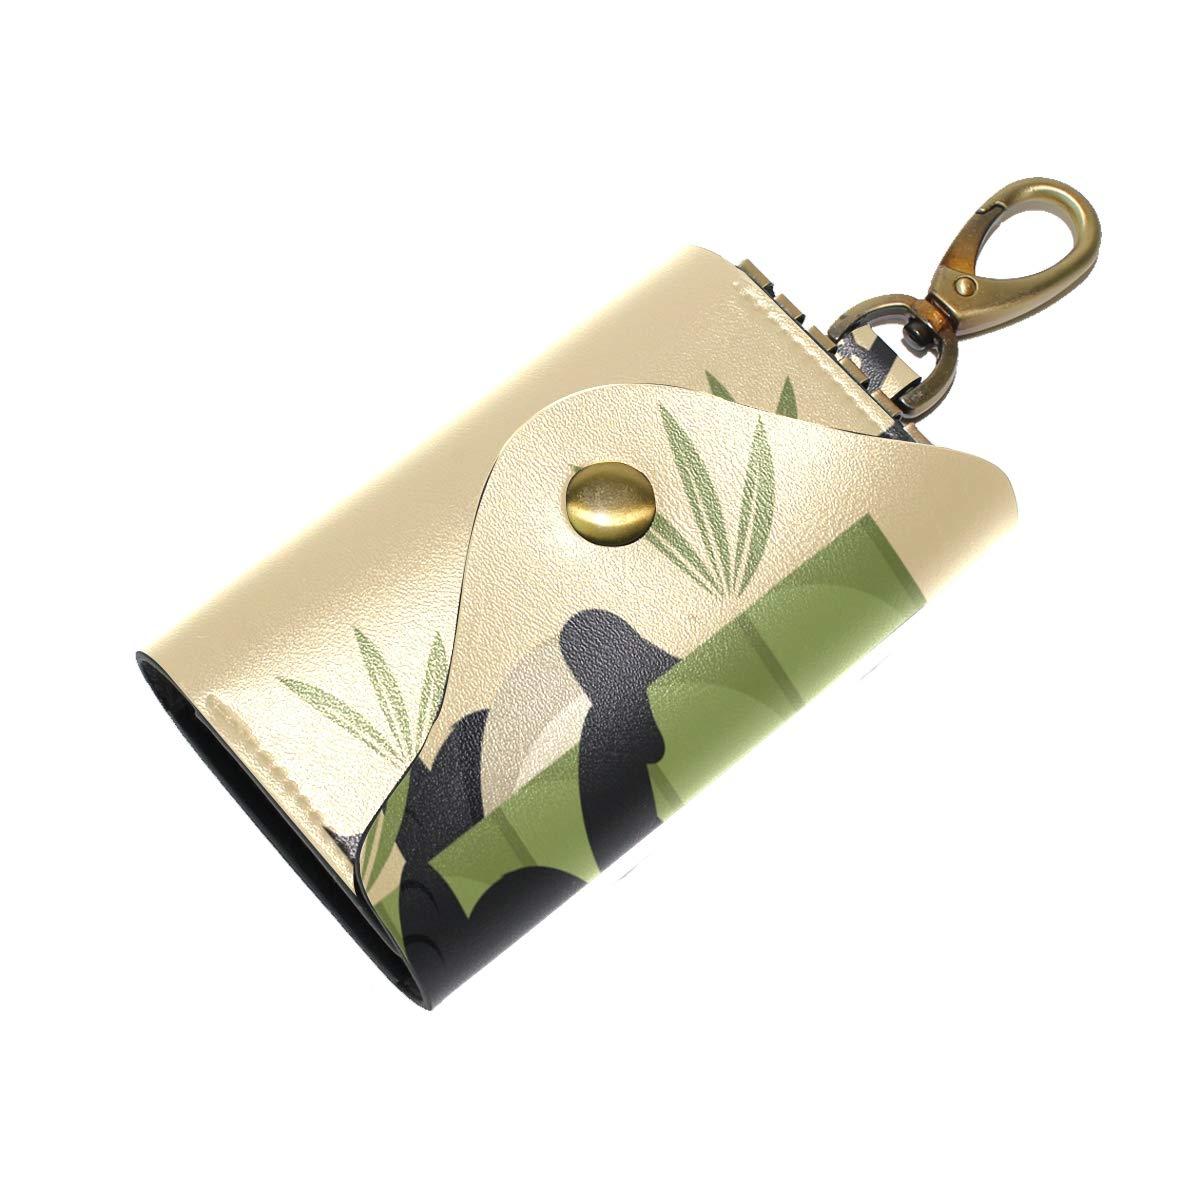 KEAKIA Black Panda Leather Key Case Wallets Tri-fold Key Holder Keychains with 6 Hooks 2 Slot Snap Closure for Men Women